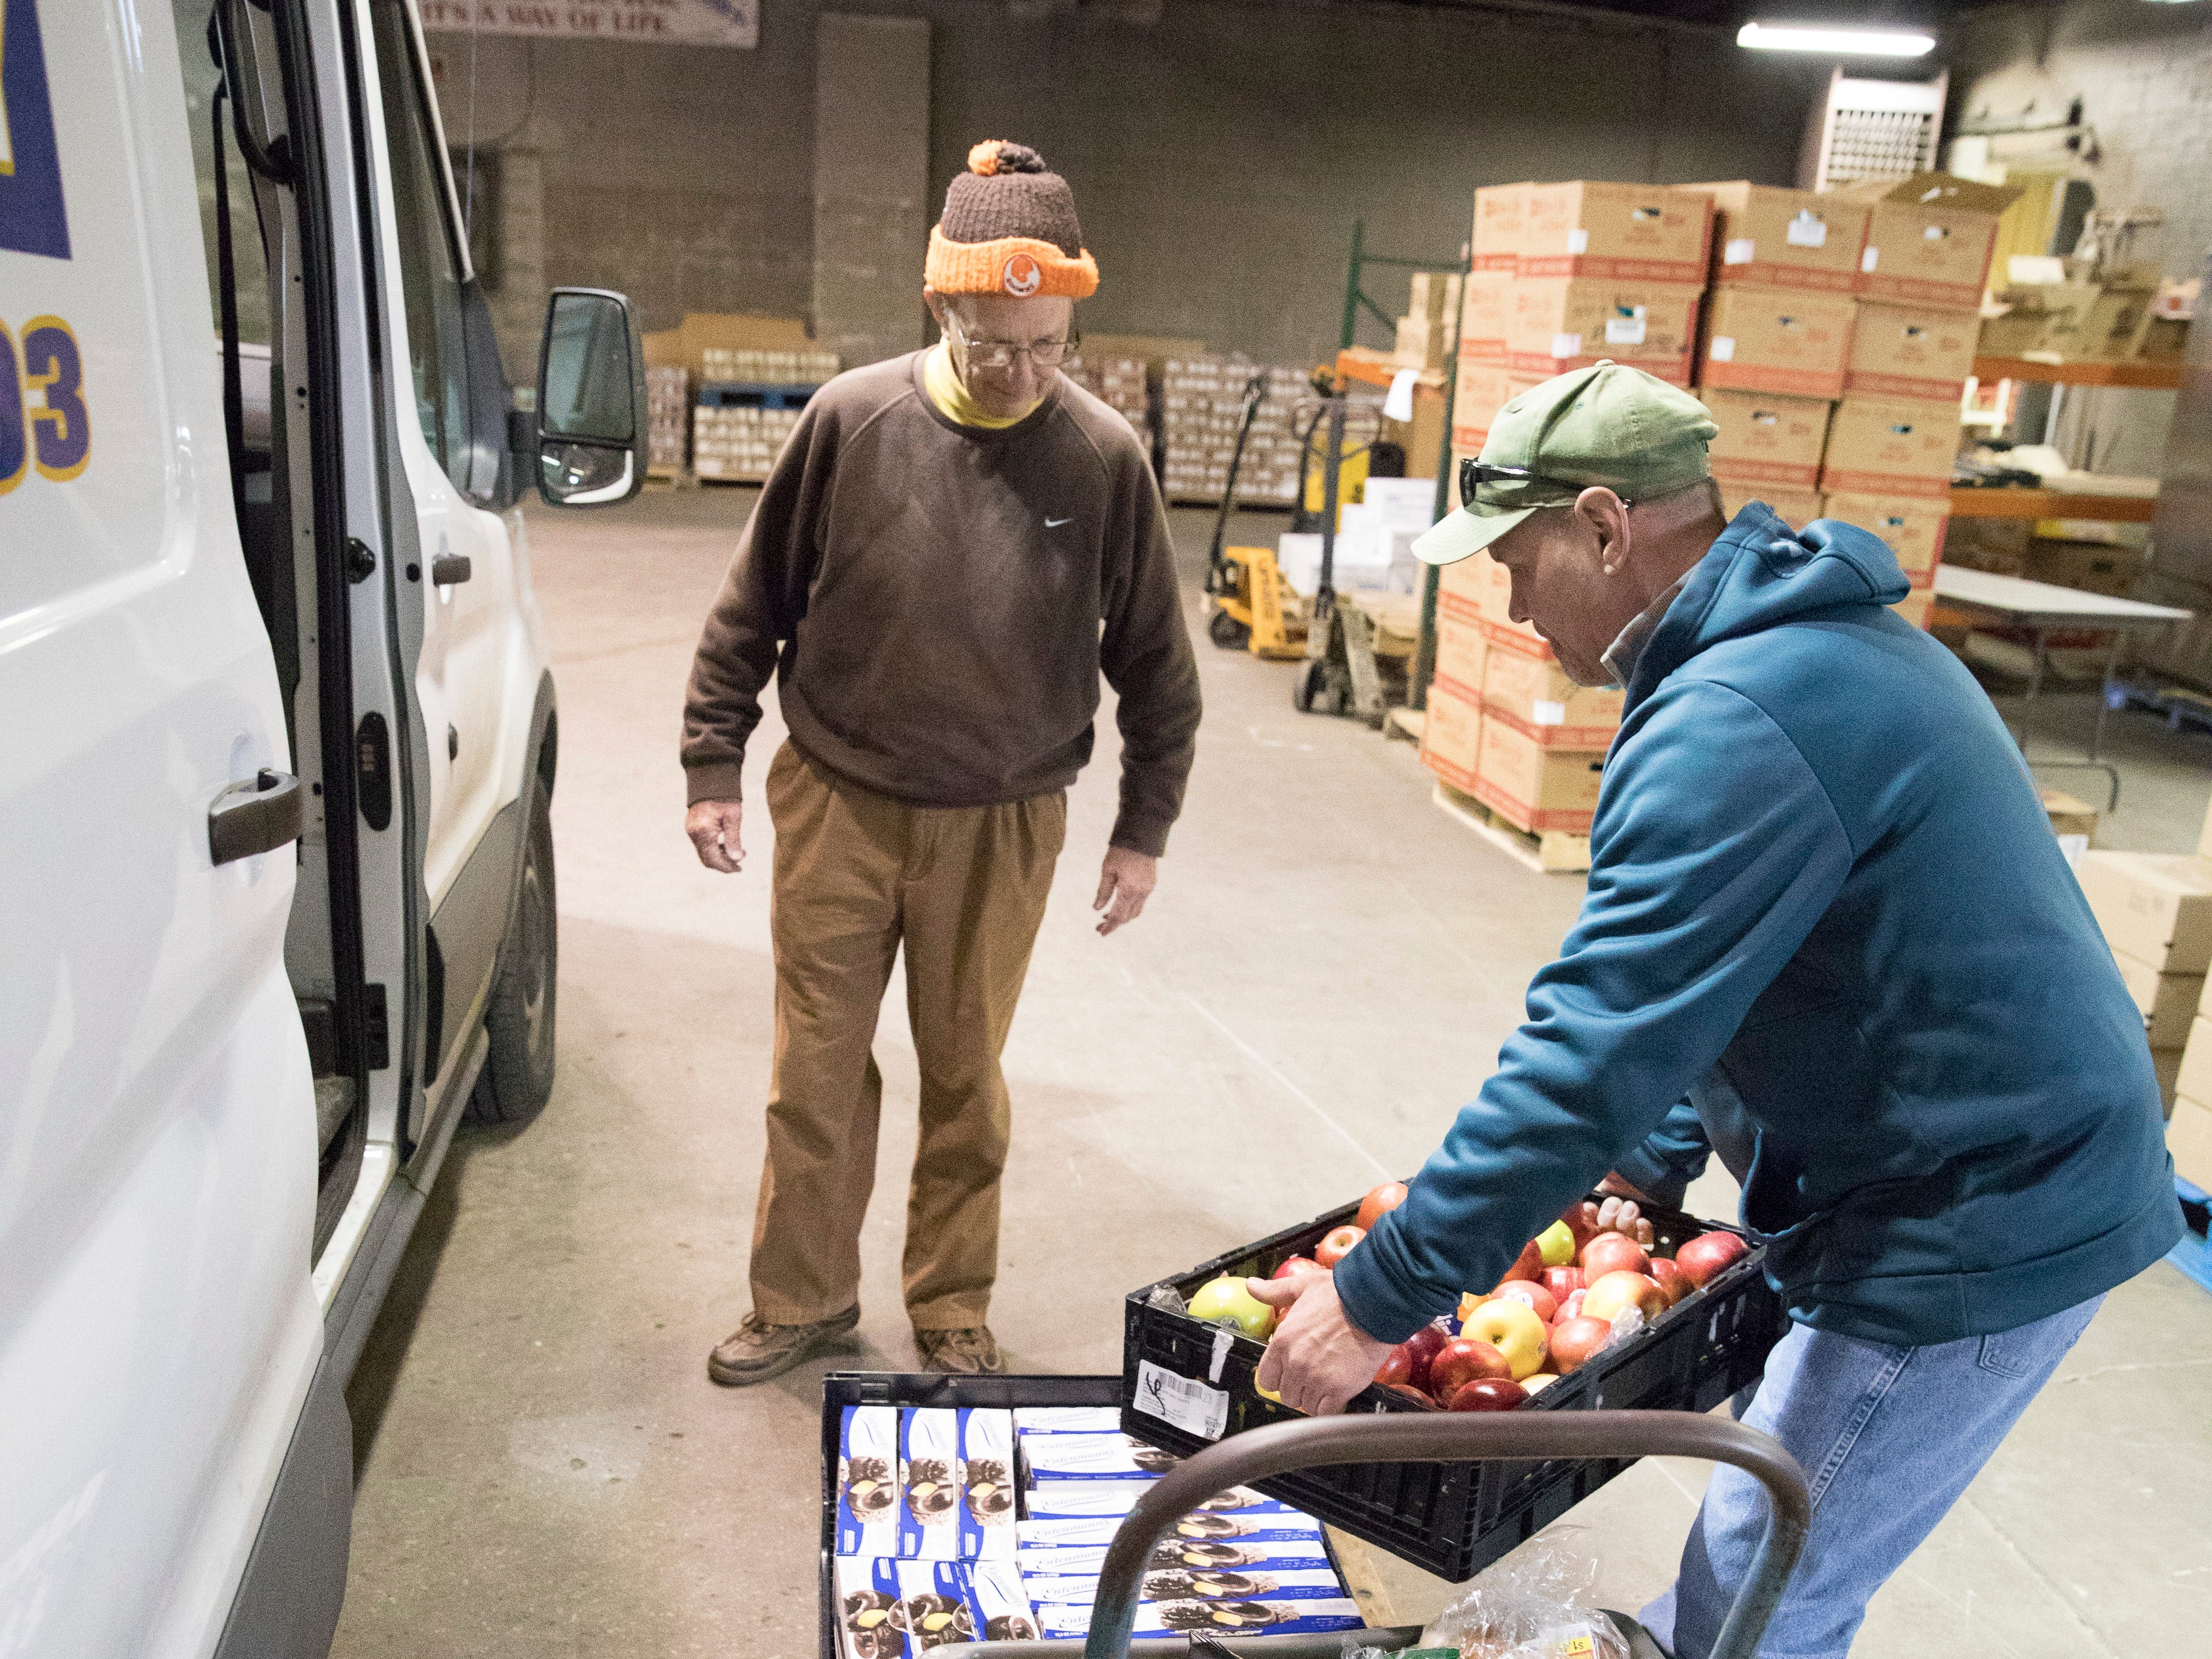 Volunteer Nate Lovett and Alvis House volunteer Steve Durham unload a truck of donated food at the Good Samaritan Food Pantry on December 10, 2018.